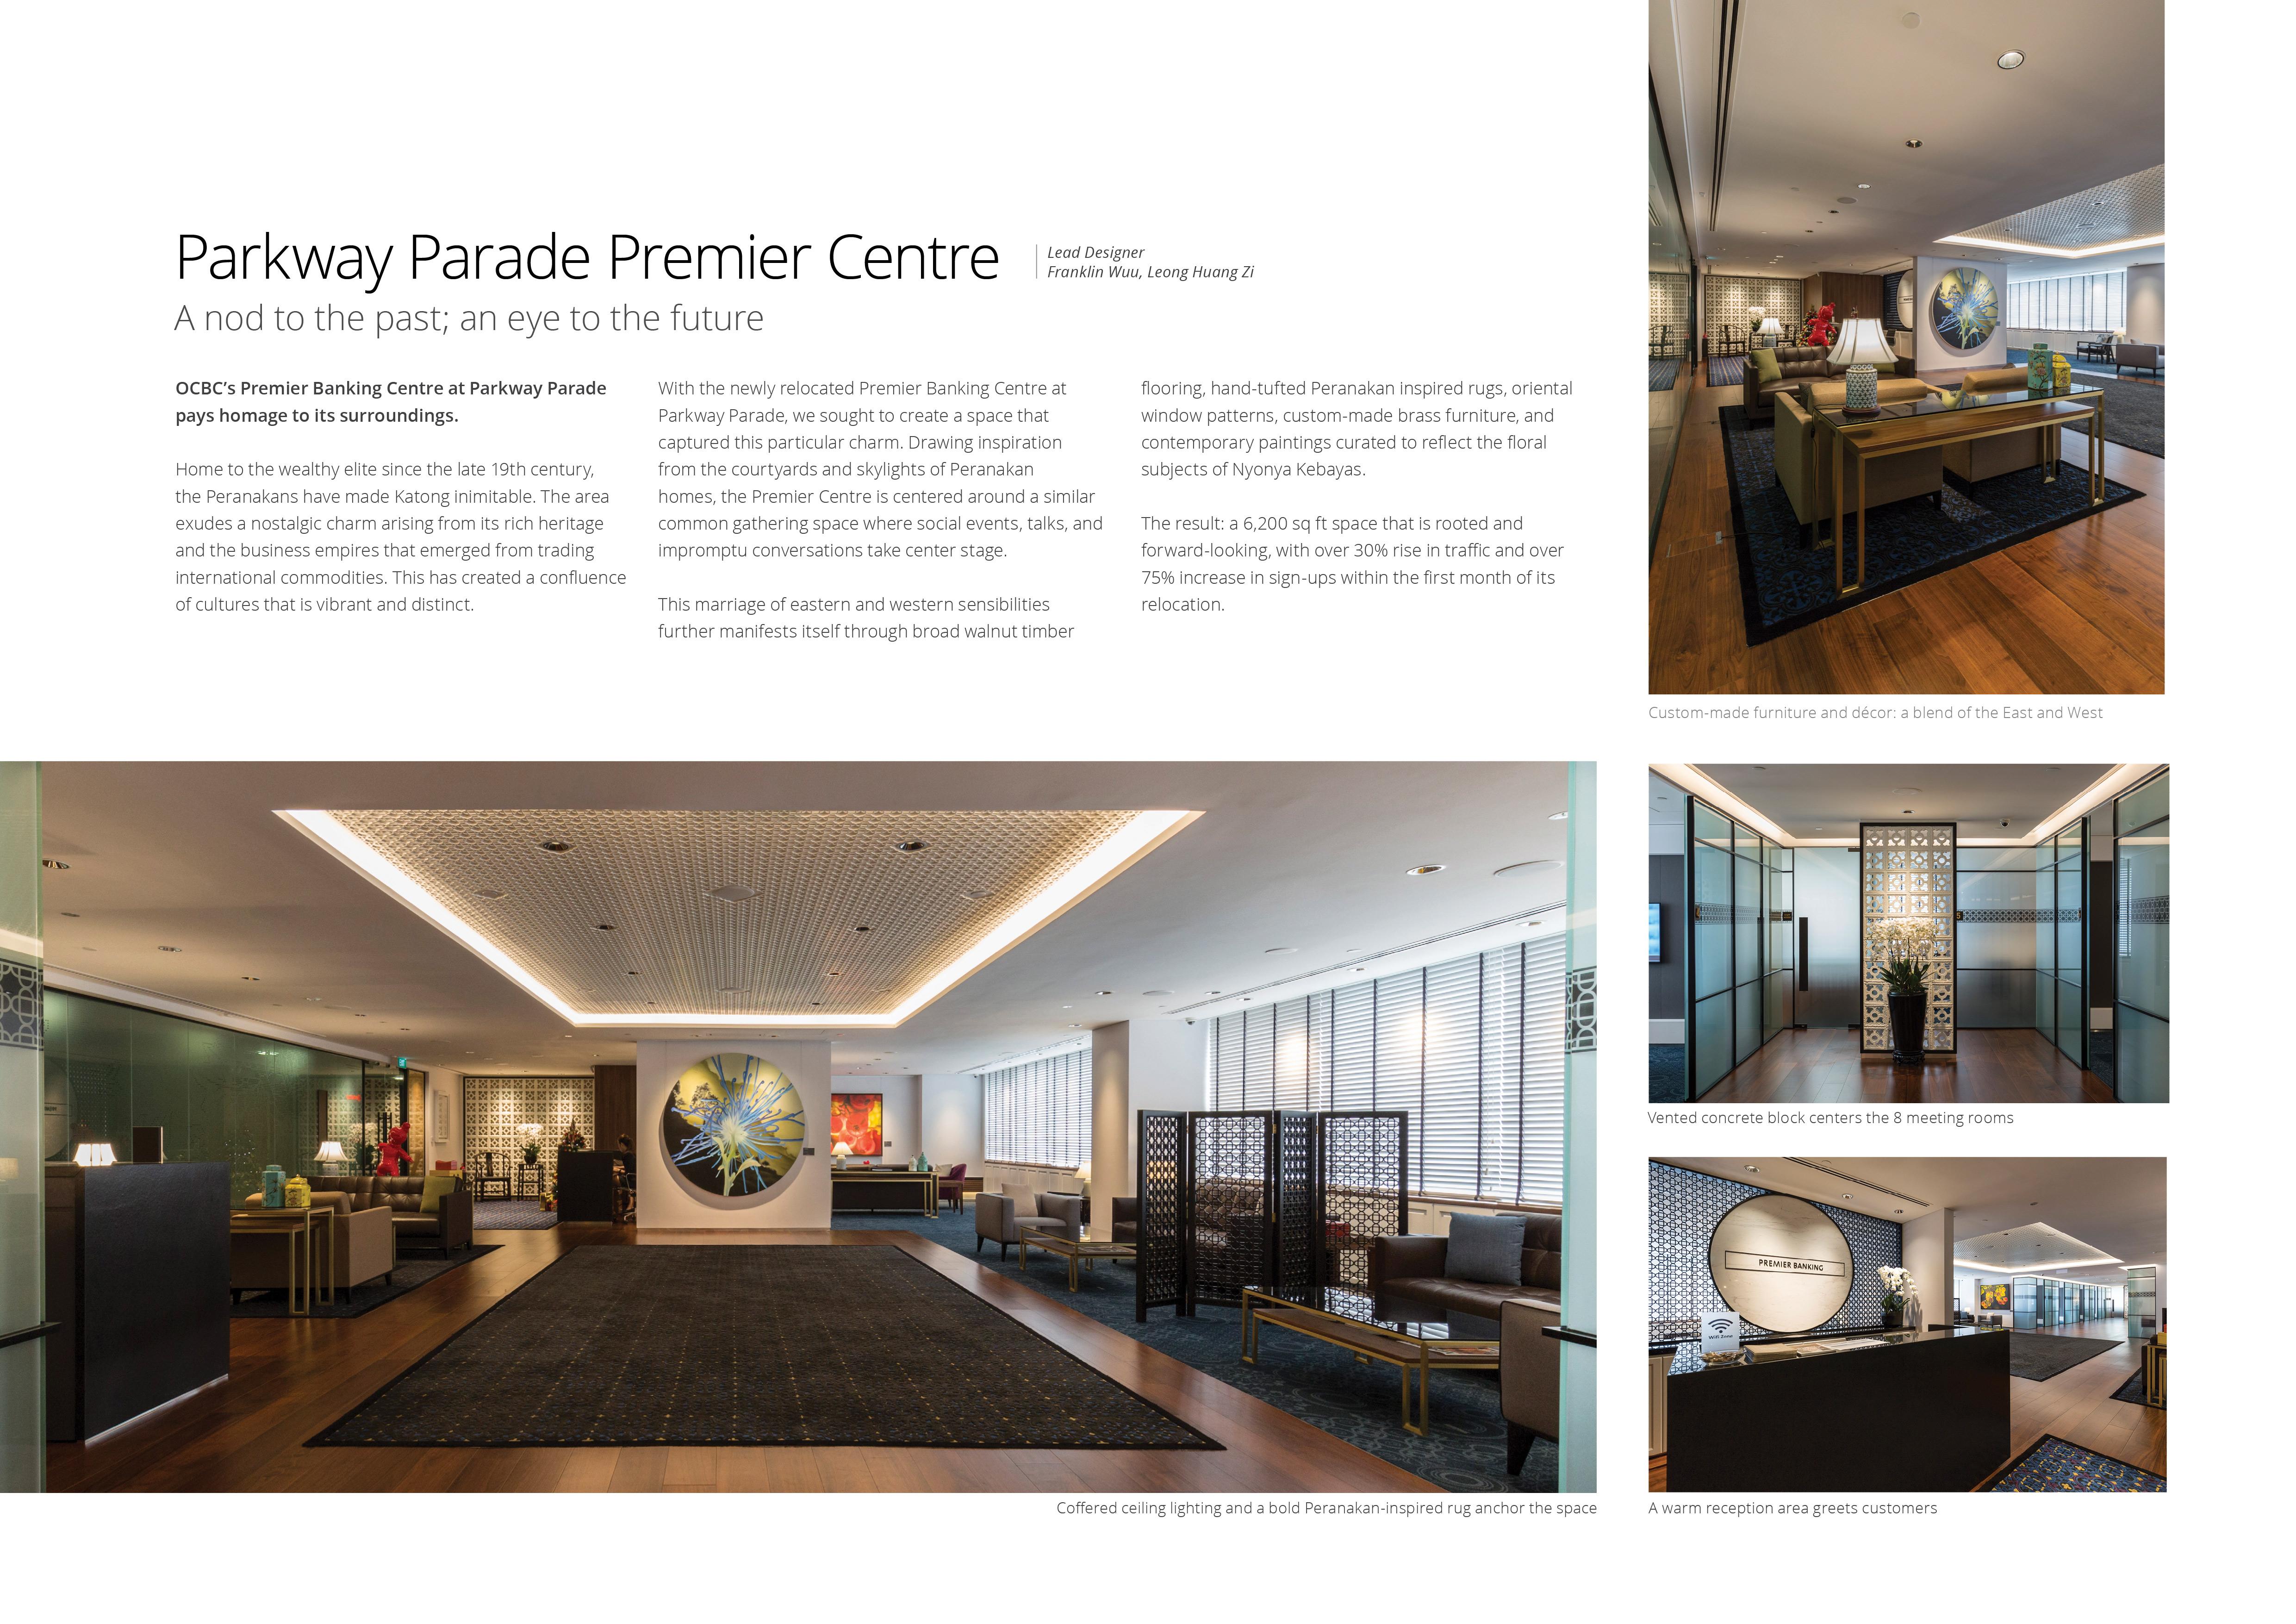 OCBC PREMIER BANKING CENTRE AT PARKWAY PARADE